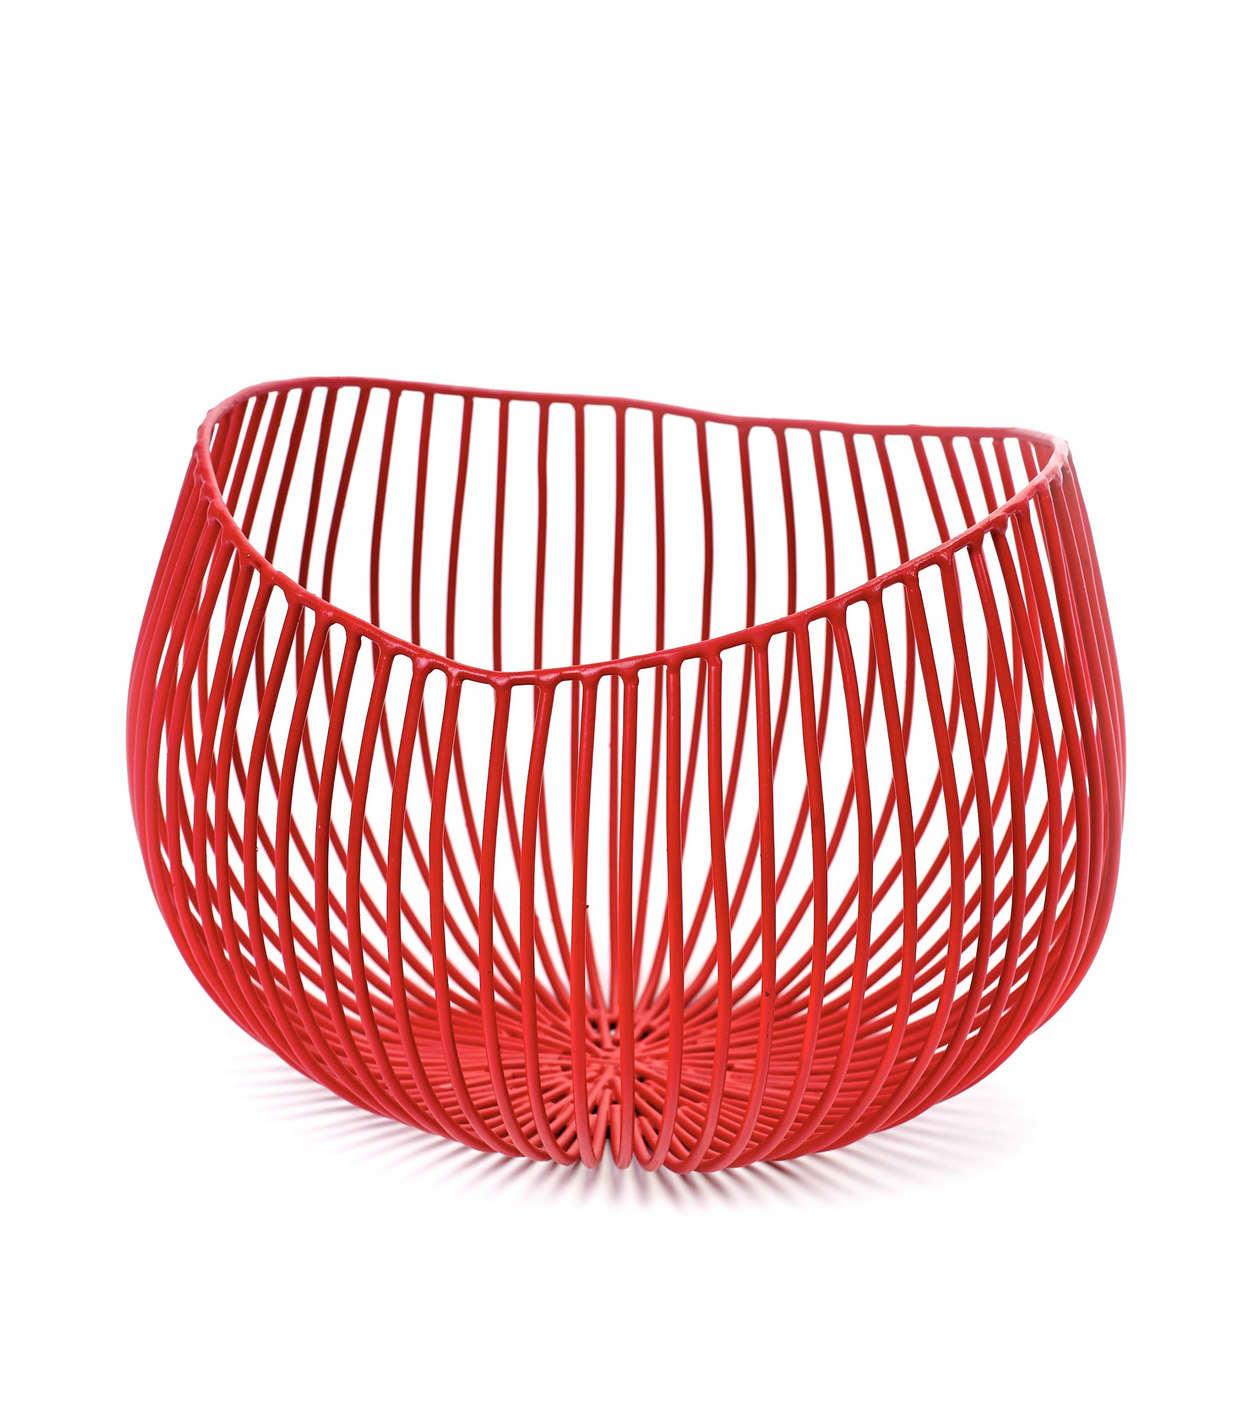 Serax Small Red Basket